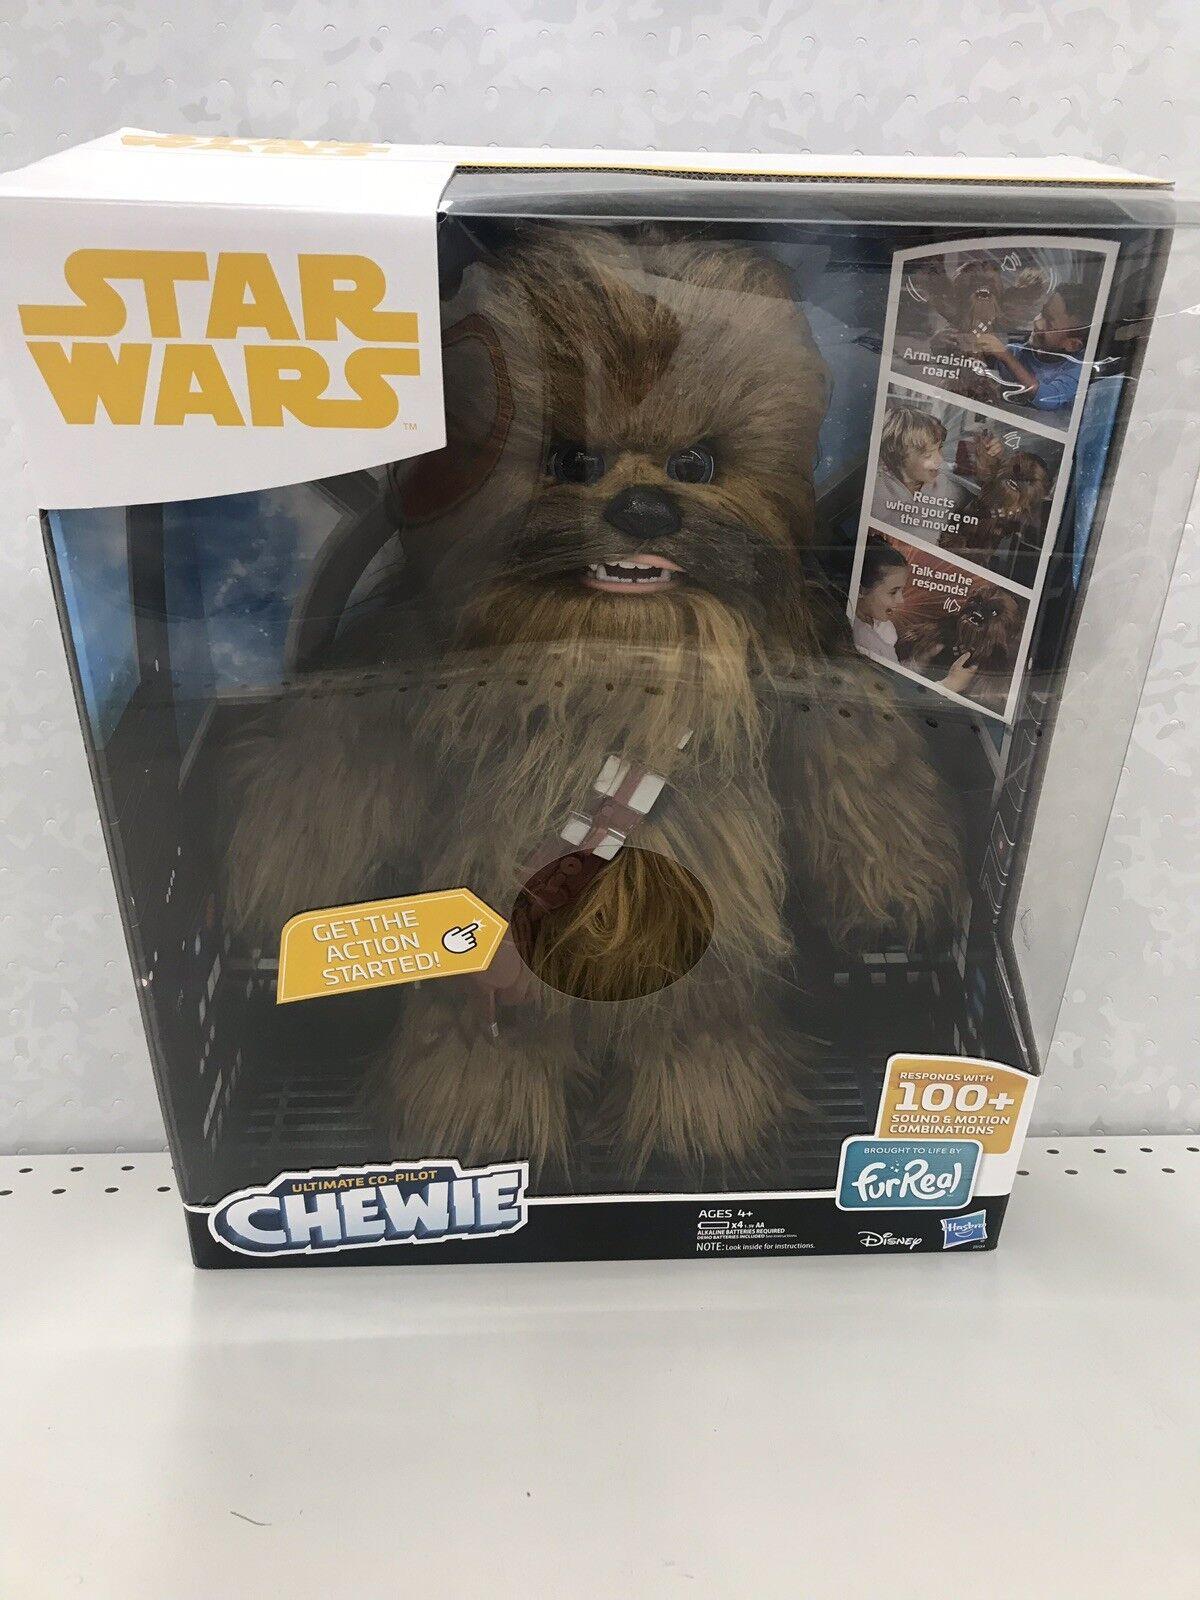 Star wars furreal ultimative co - pilot chewie interaktive 16  chewbacca spielzeug, neuer